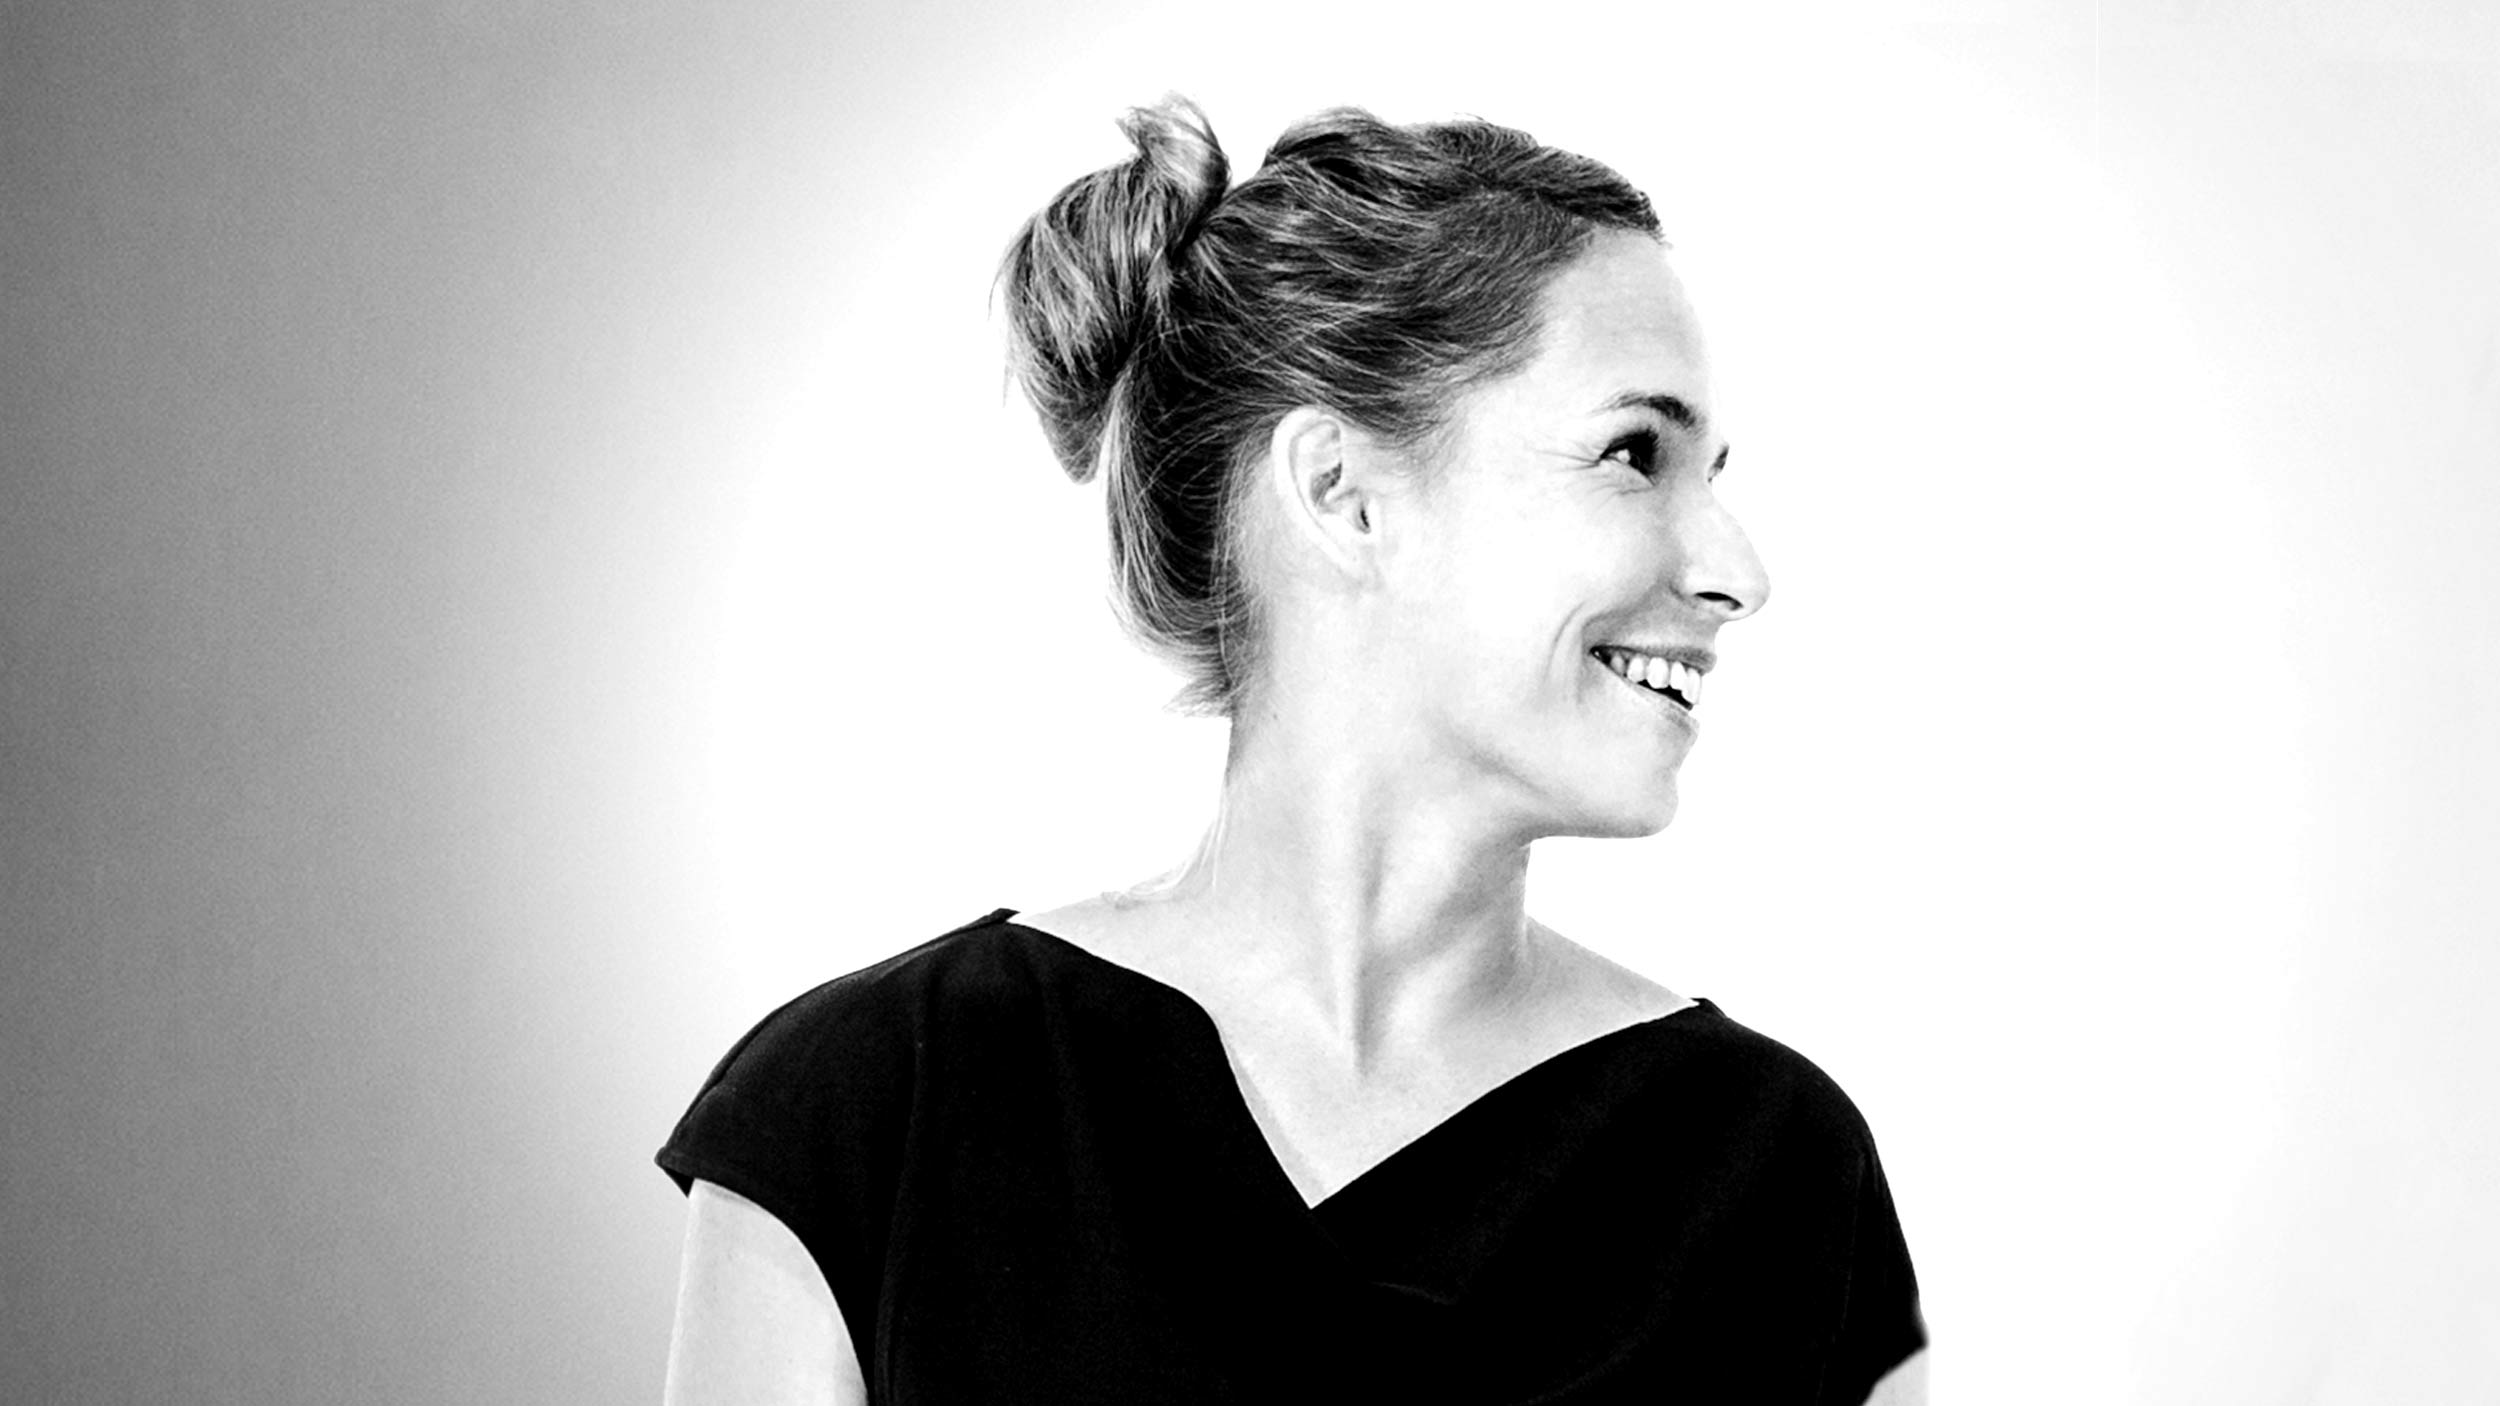 Nancy Birkhölzer